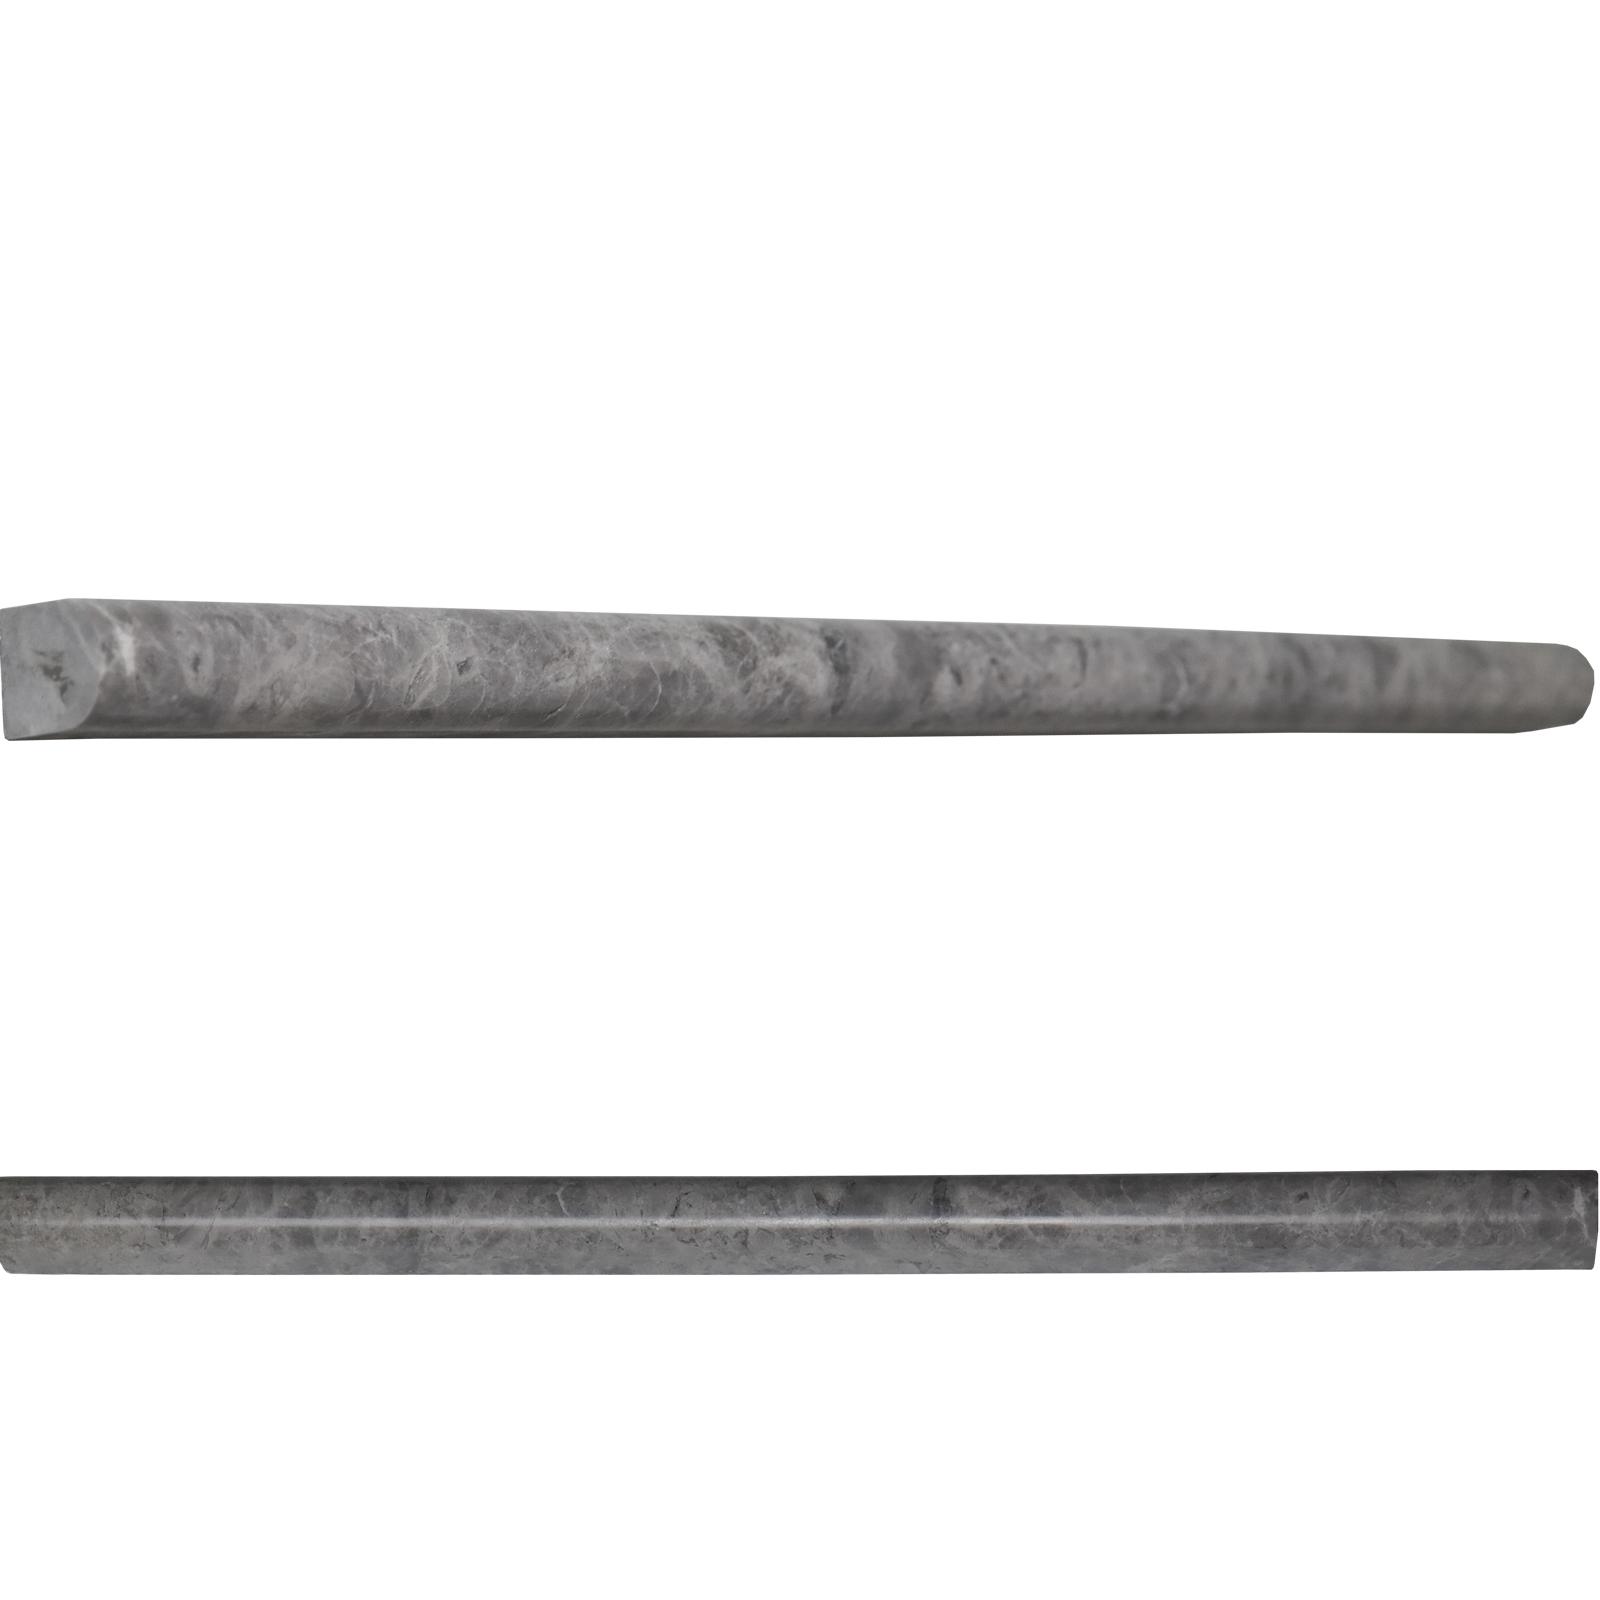 Liner Trim Molding Dark Grey Marble